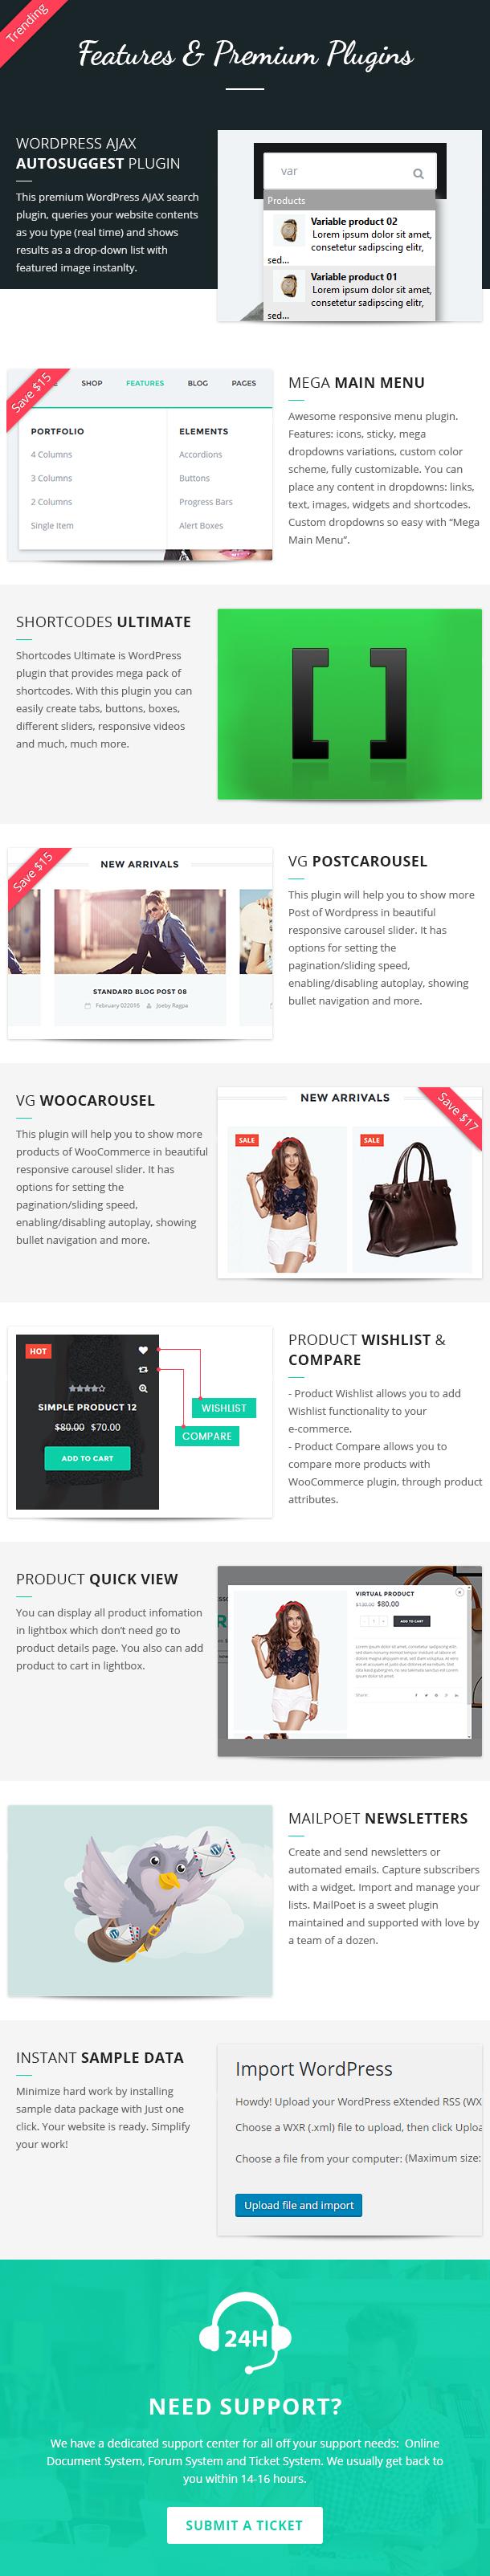 VG Amadea - Multipurpose WordPress Theme - 19